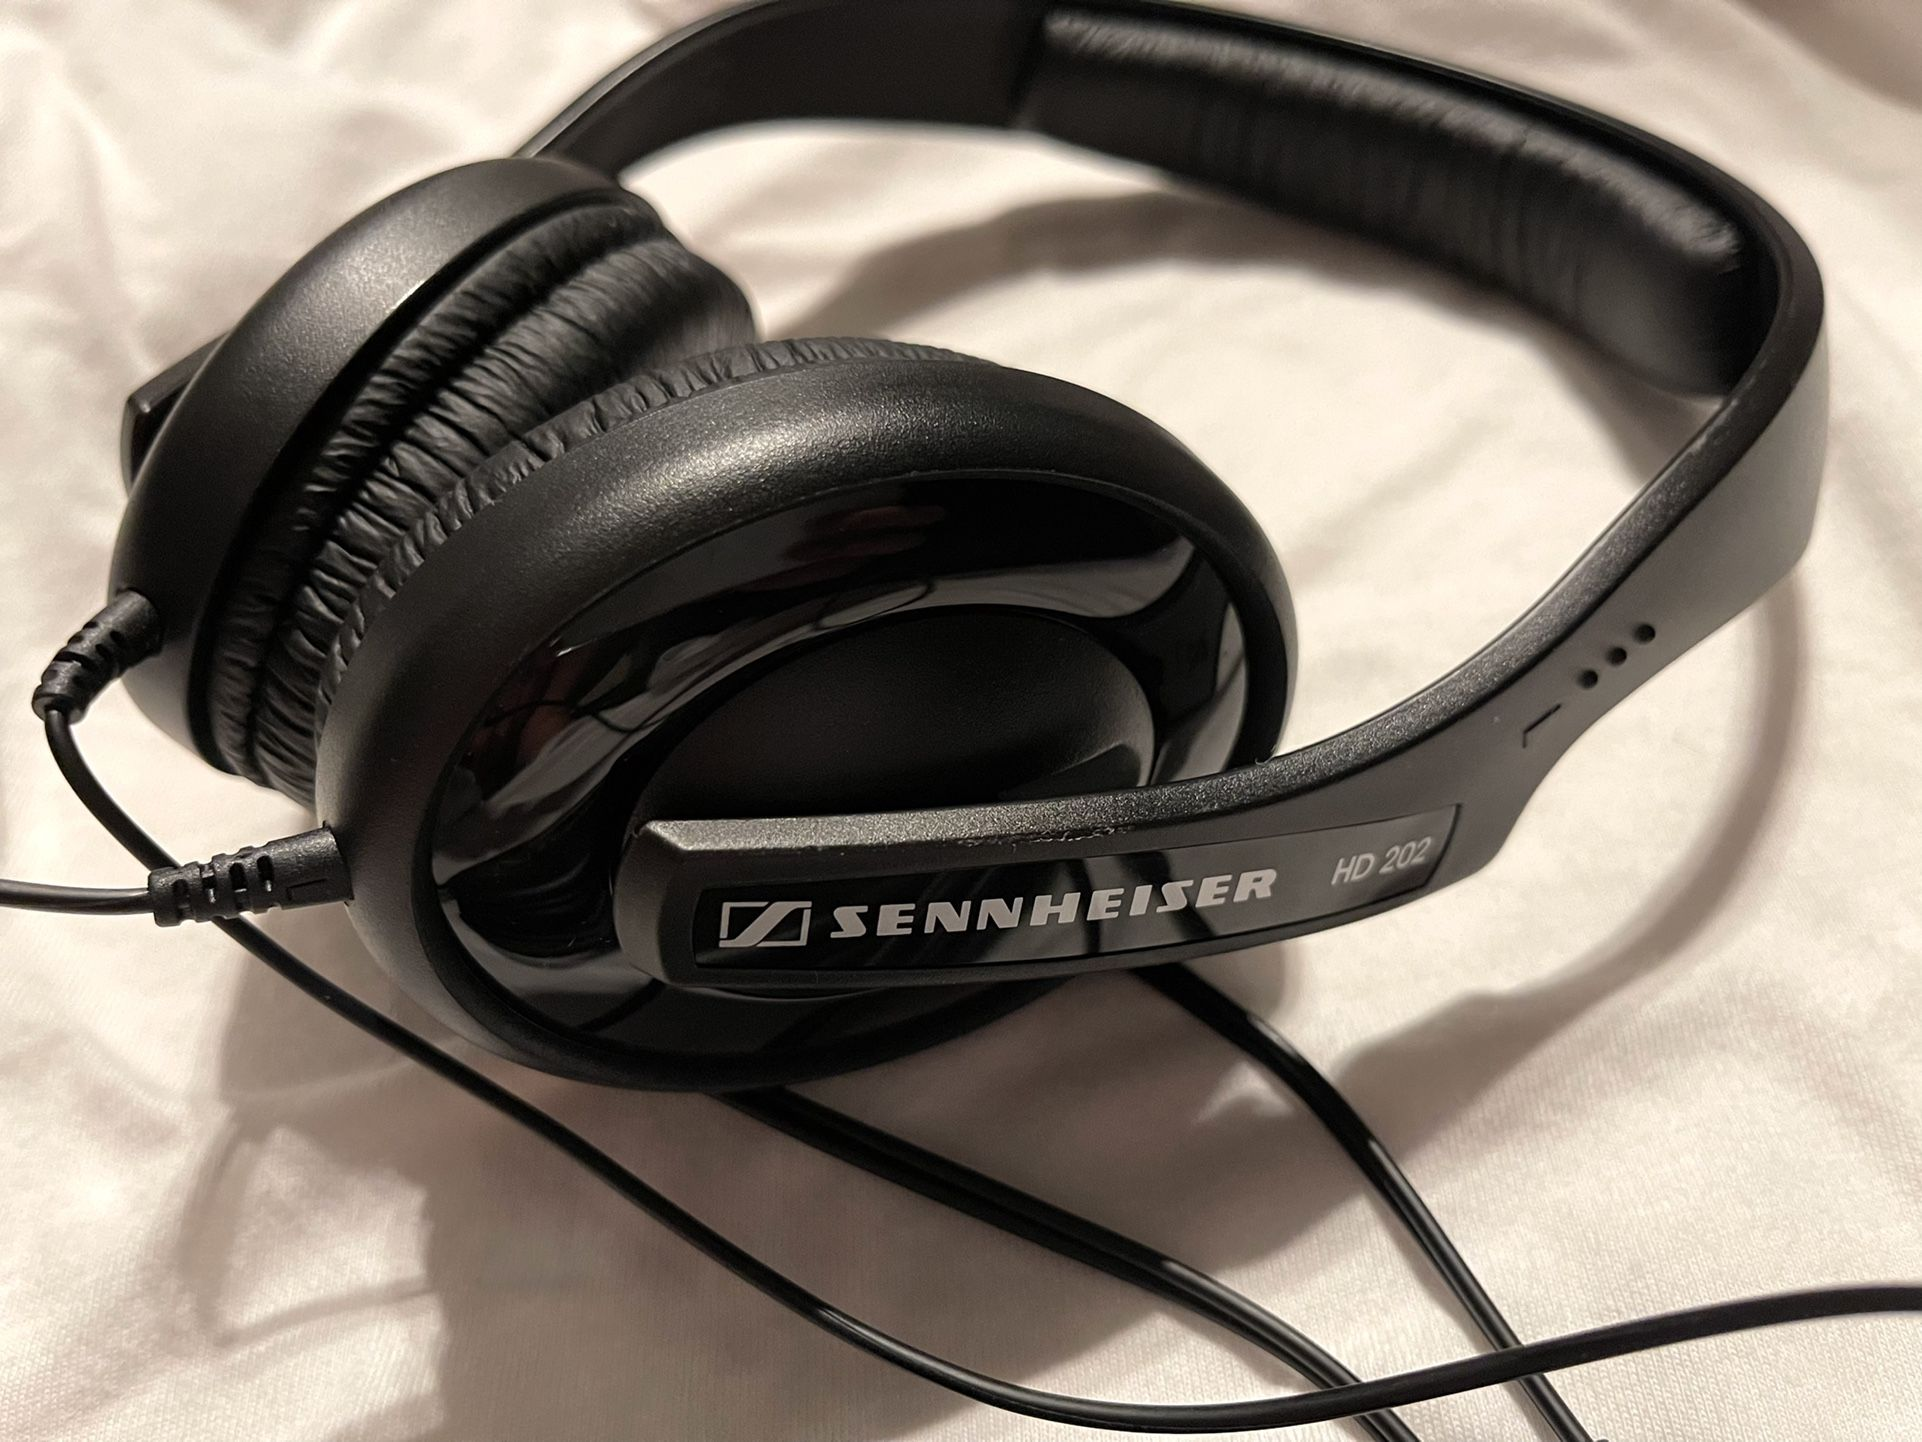 SENNHEISER PROFESSIONAL WIRED HEADPHONE